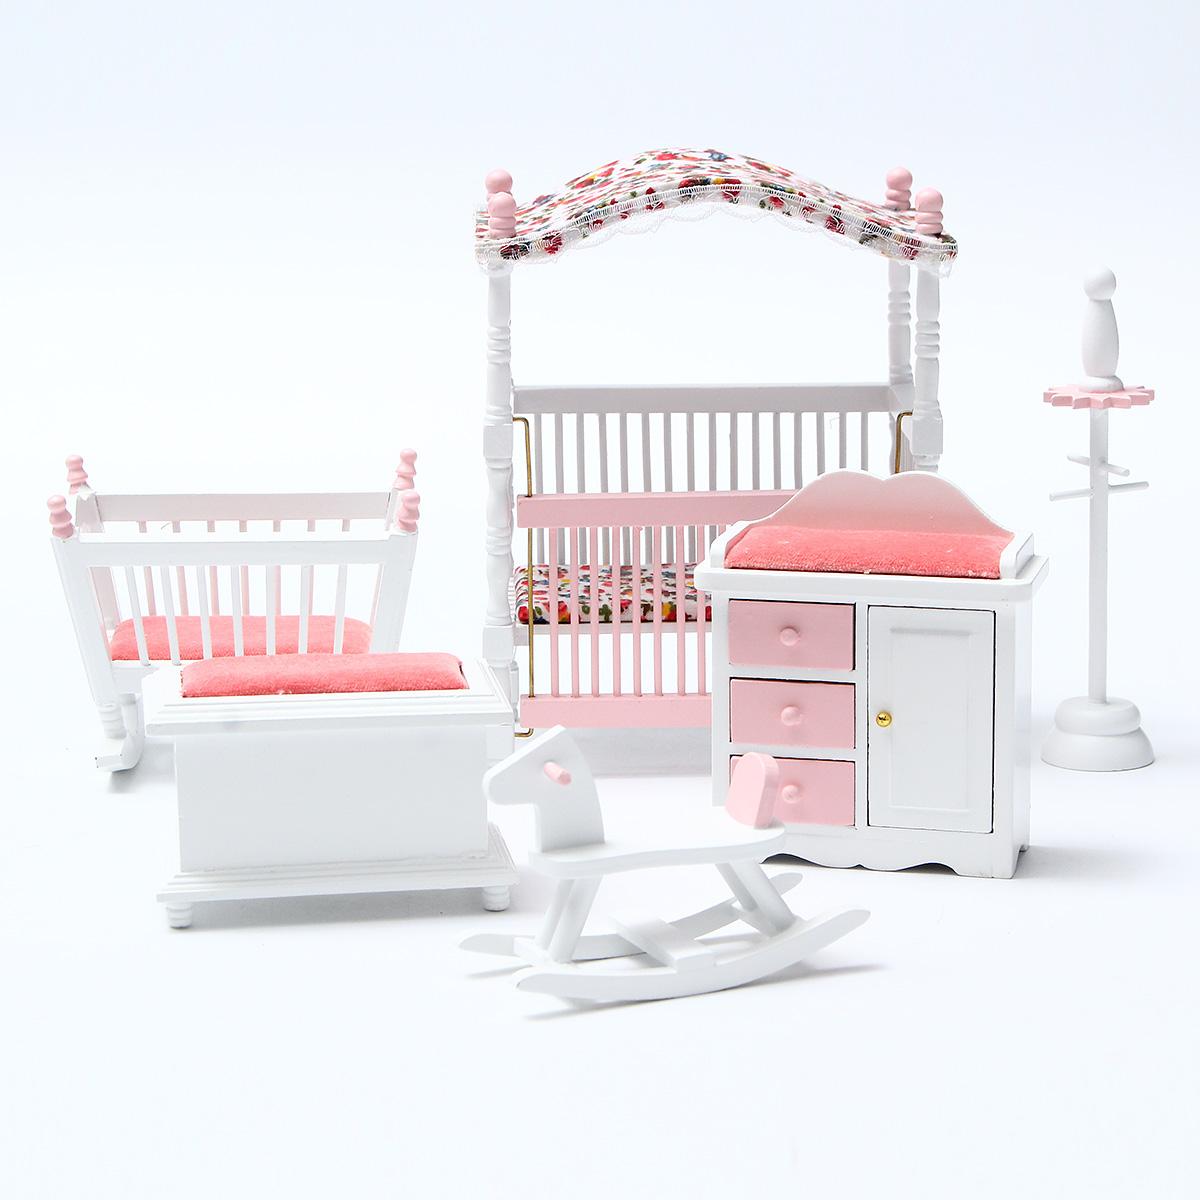 bedroom chair for clothes revolving cream 6pcs 1 12 dollhouse miniature wood european departments